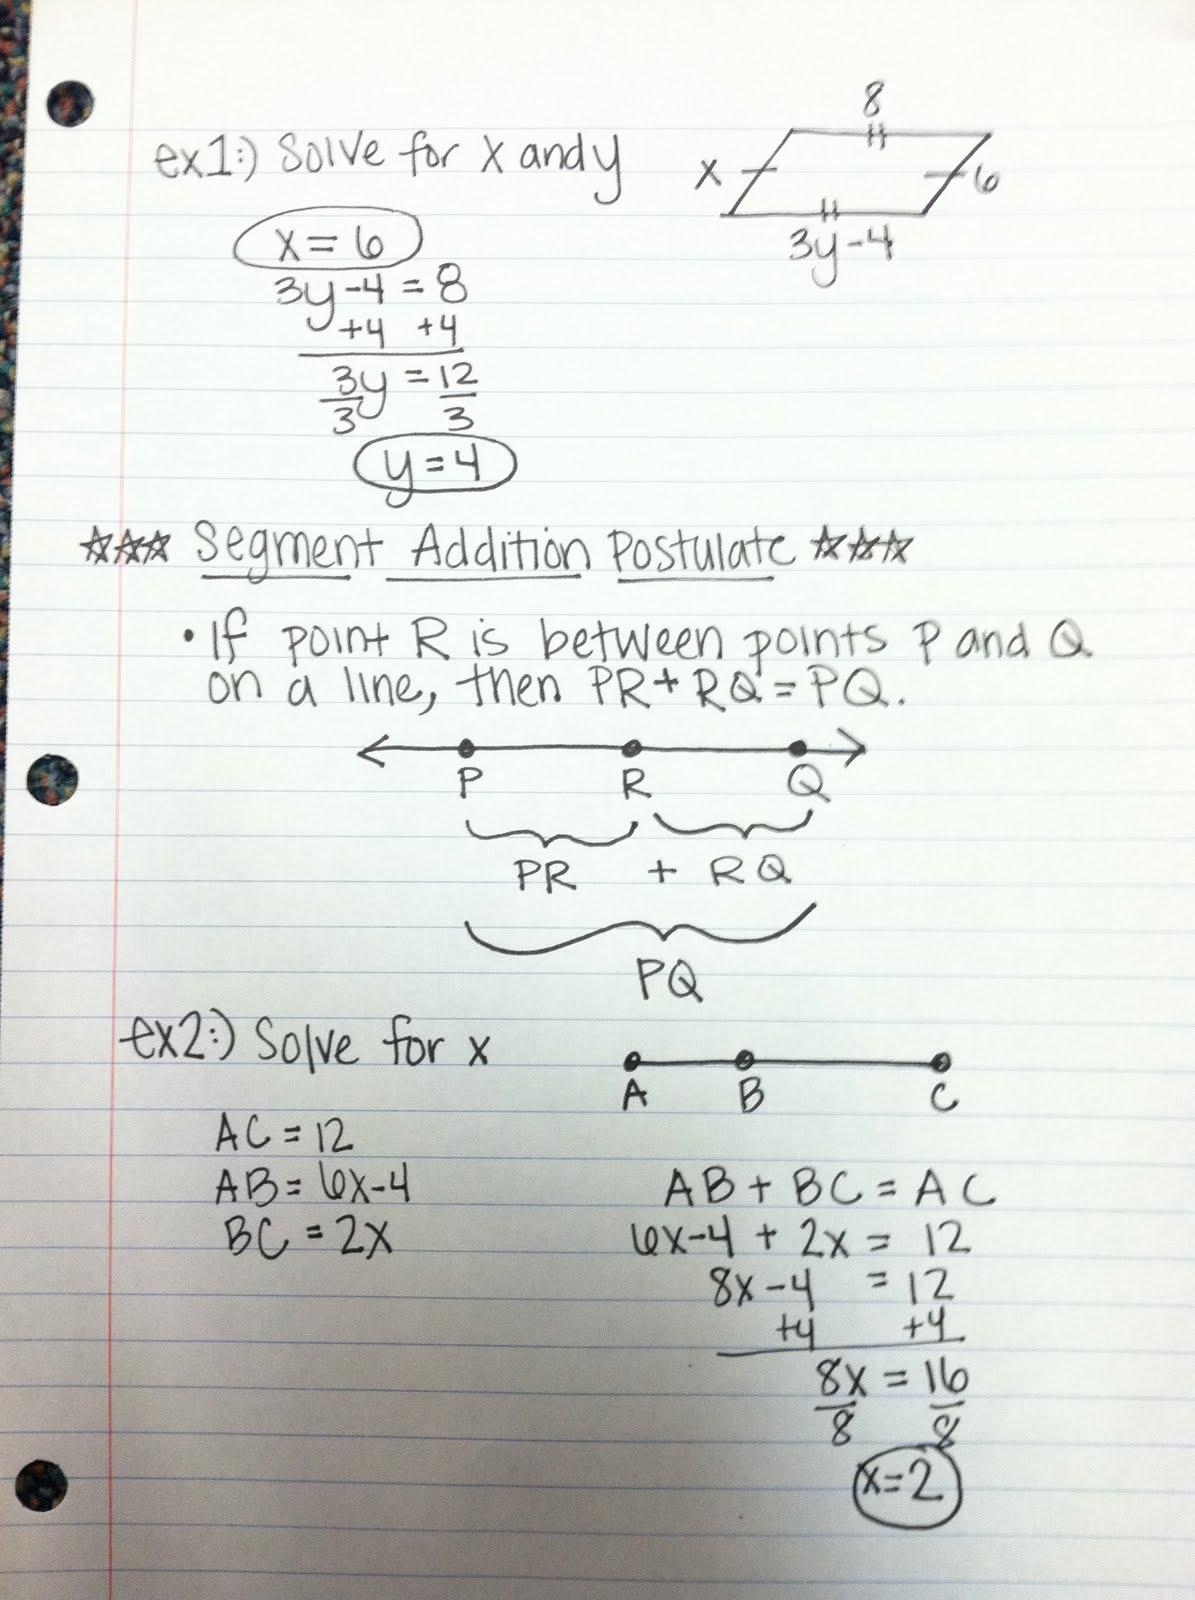 Geometry 1 2 Segment Addition Postulate